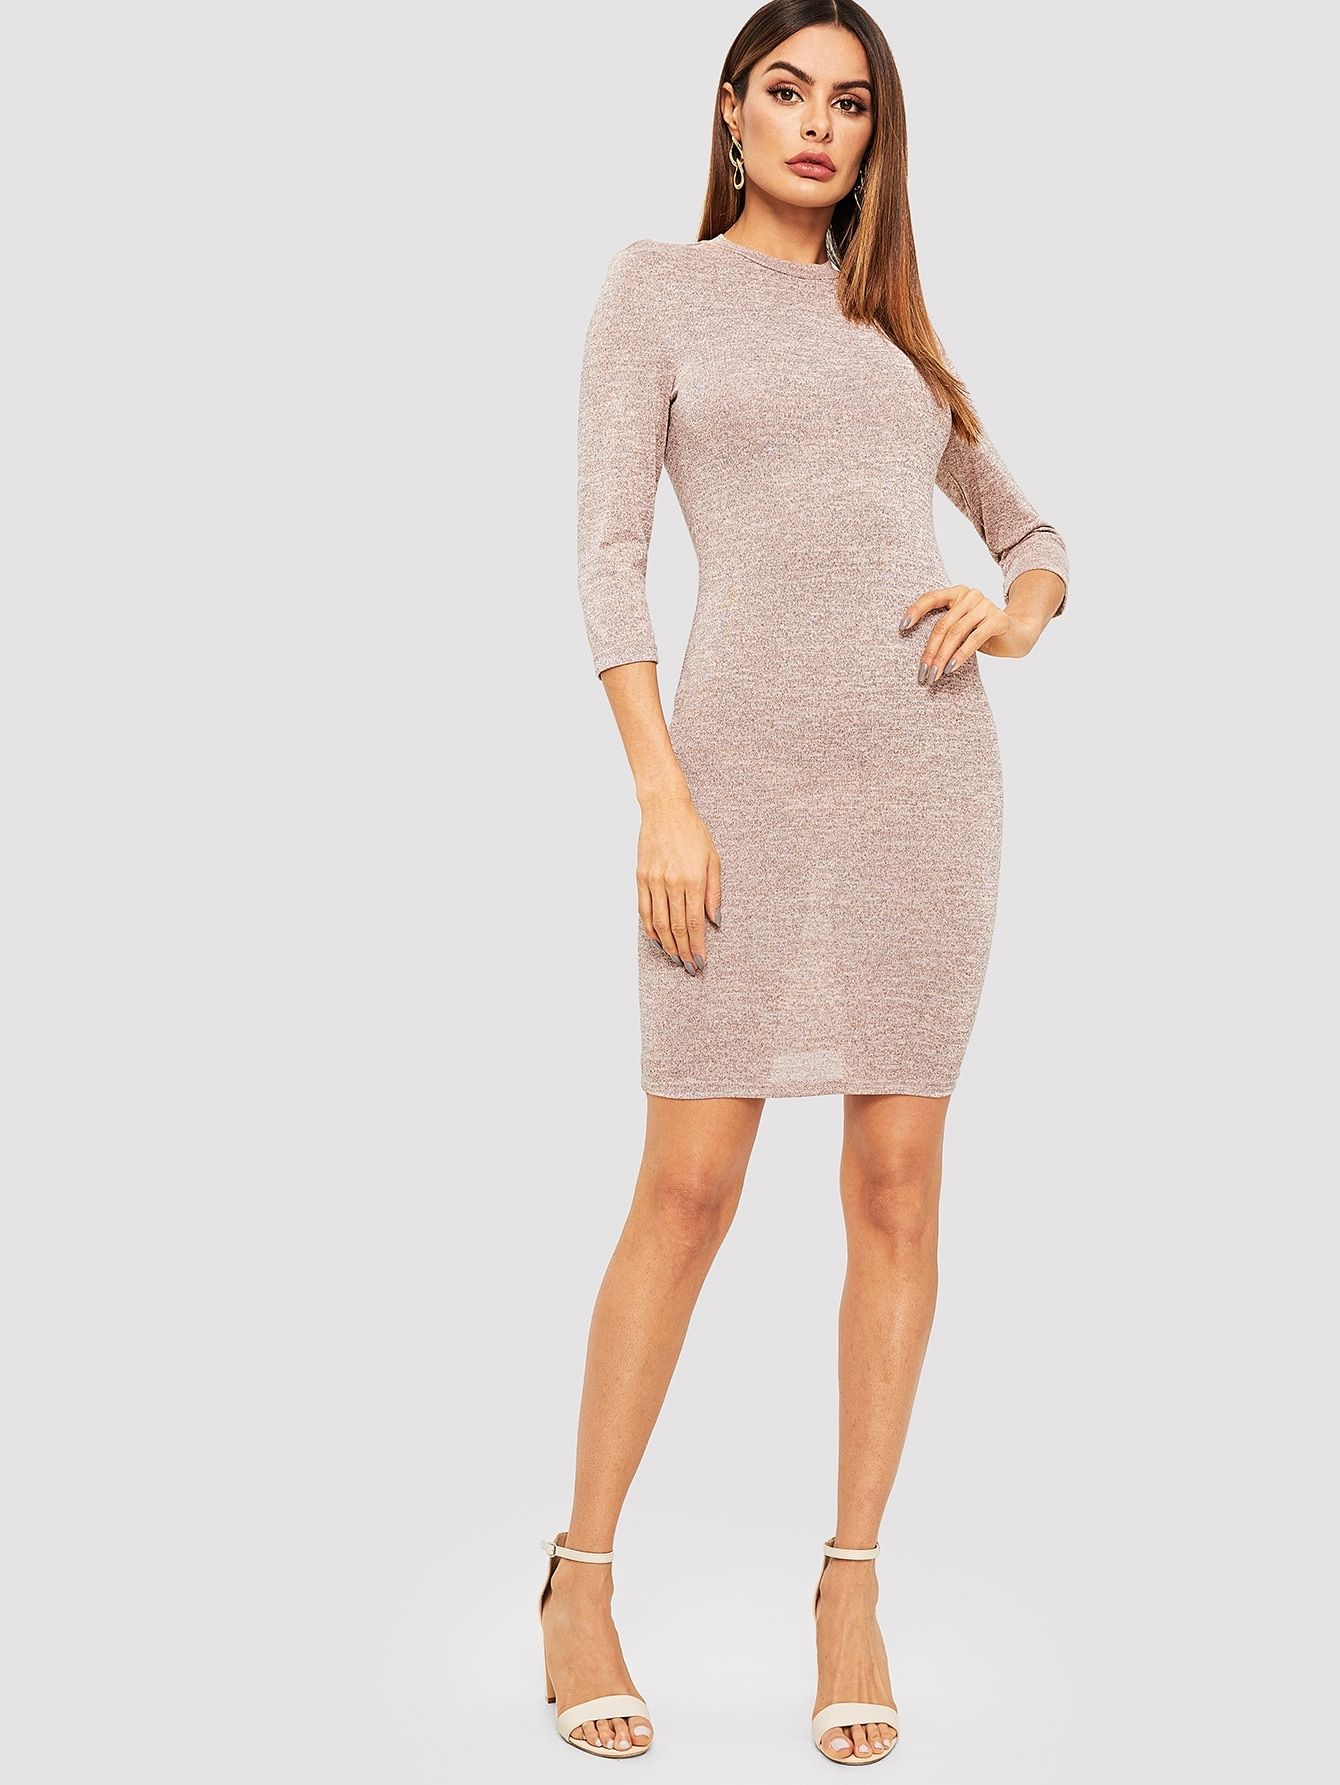 0483ba416e95 Casual Plain Sheath Round Neck Long Sleeve Natural Pink Short Length Long  Sleeve Solid Bodycon Dress